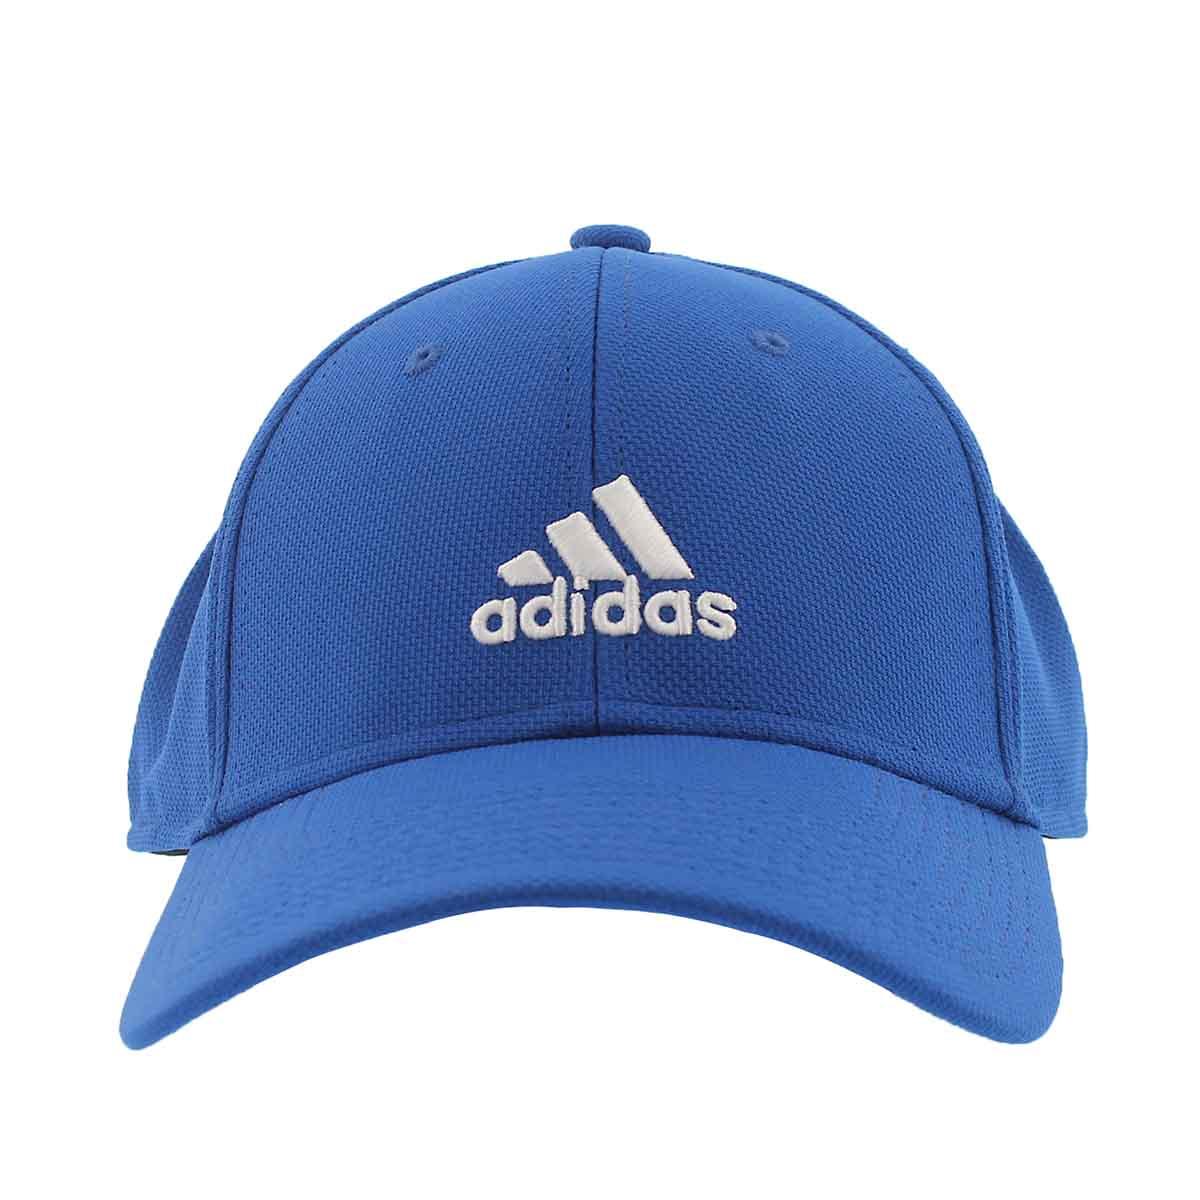 Men's RUCKER STRETCH FIT blue/white caps